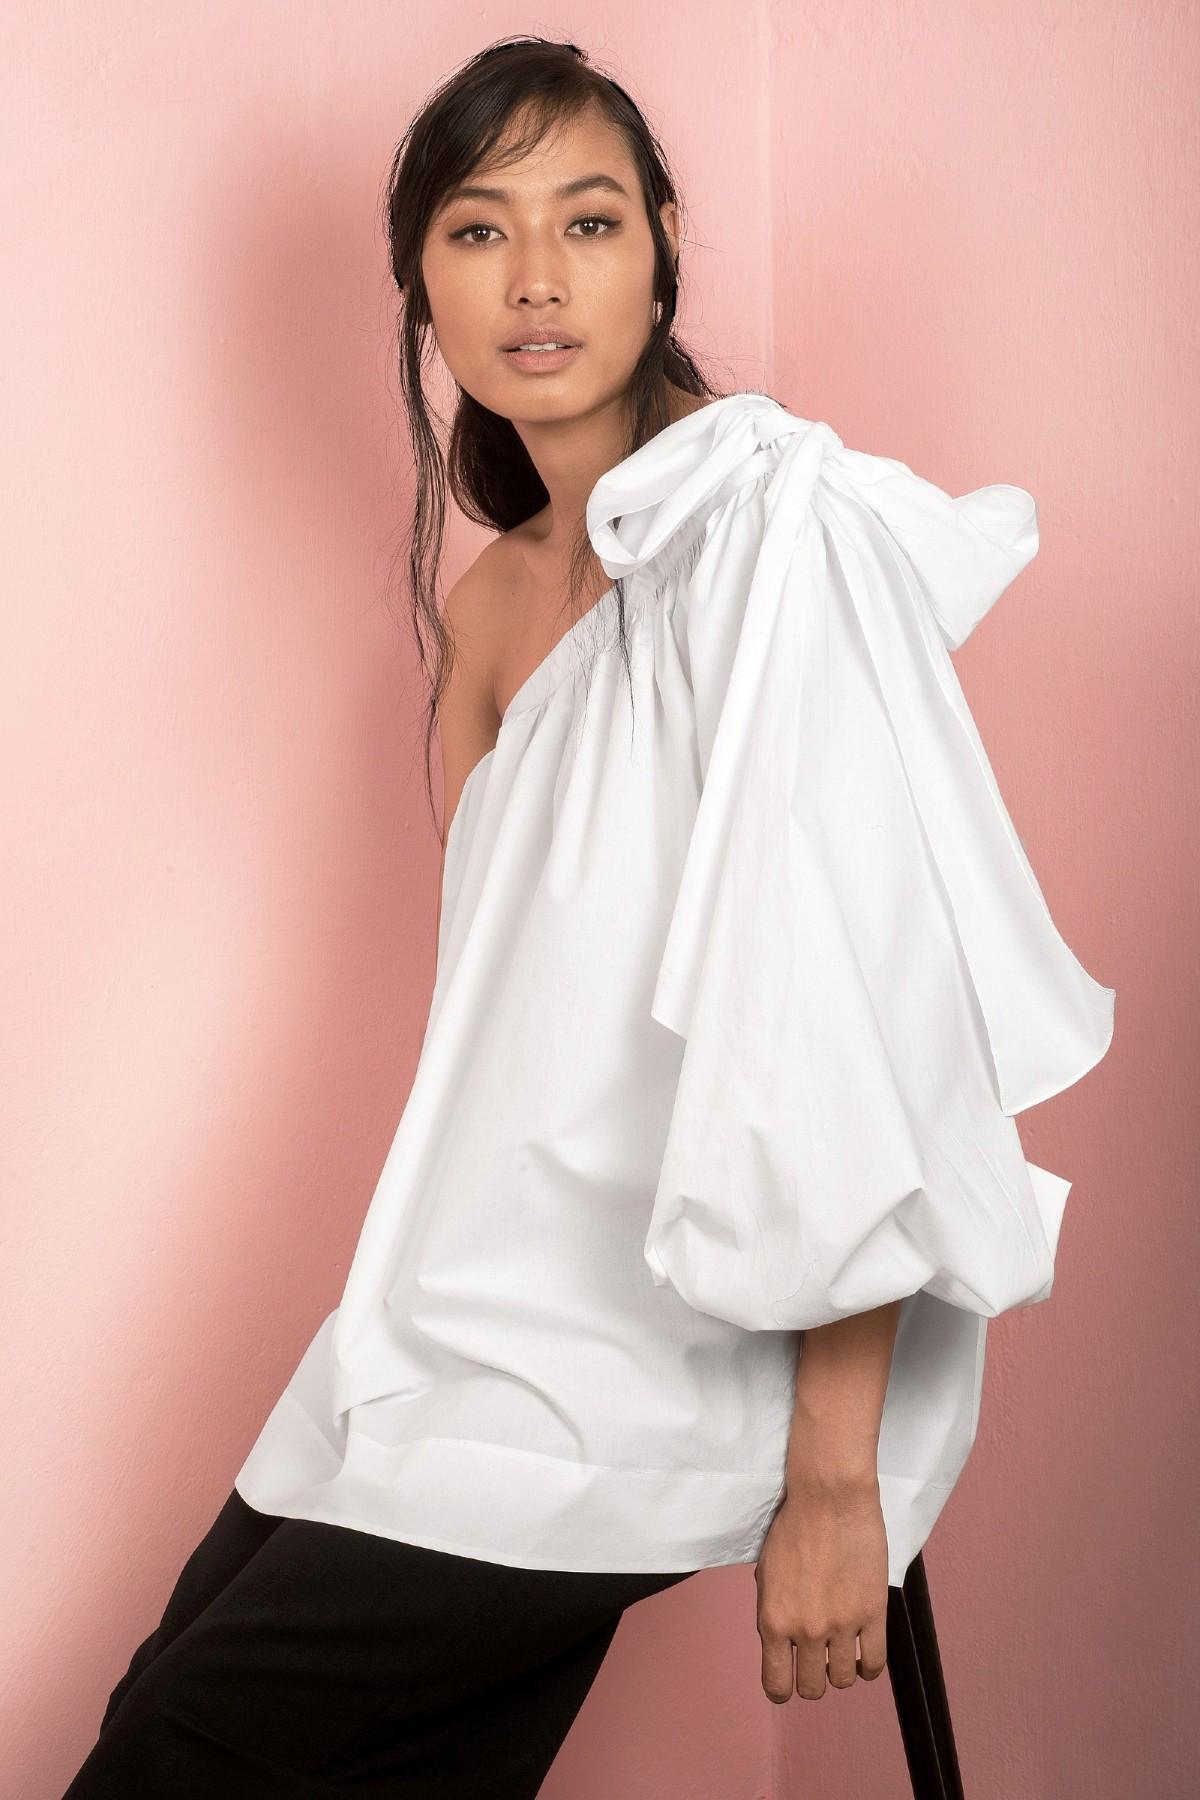 d53ecfde96801 ATSU - buy designer clothing online